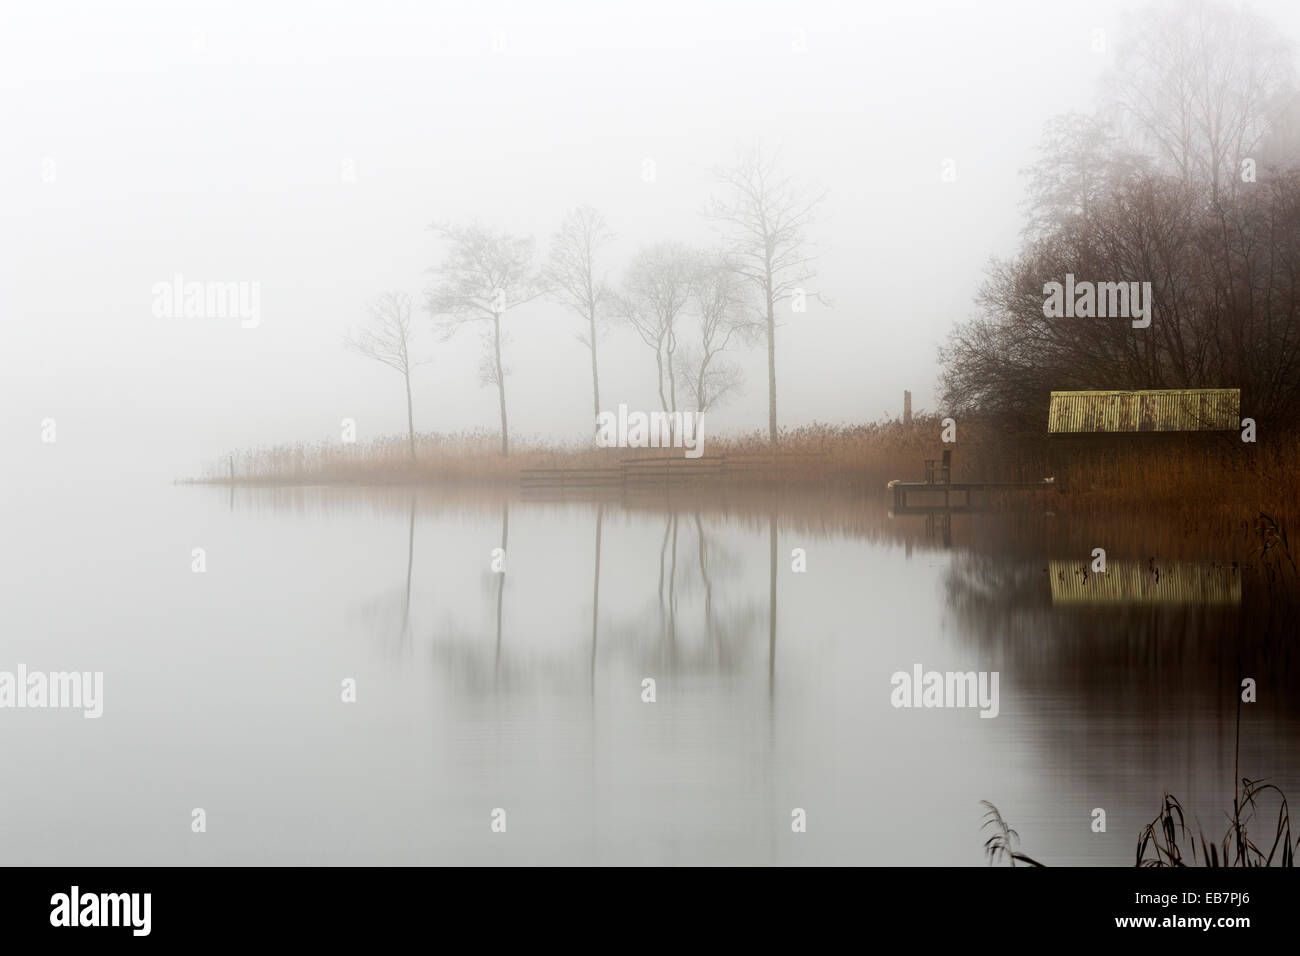 Loch Ard, The Trossachs, Scotland, November 2014 - Stock Image